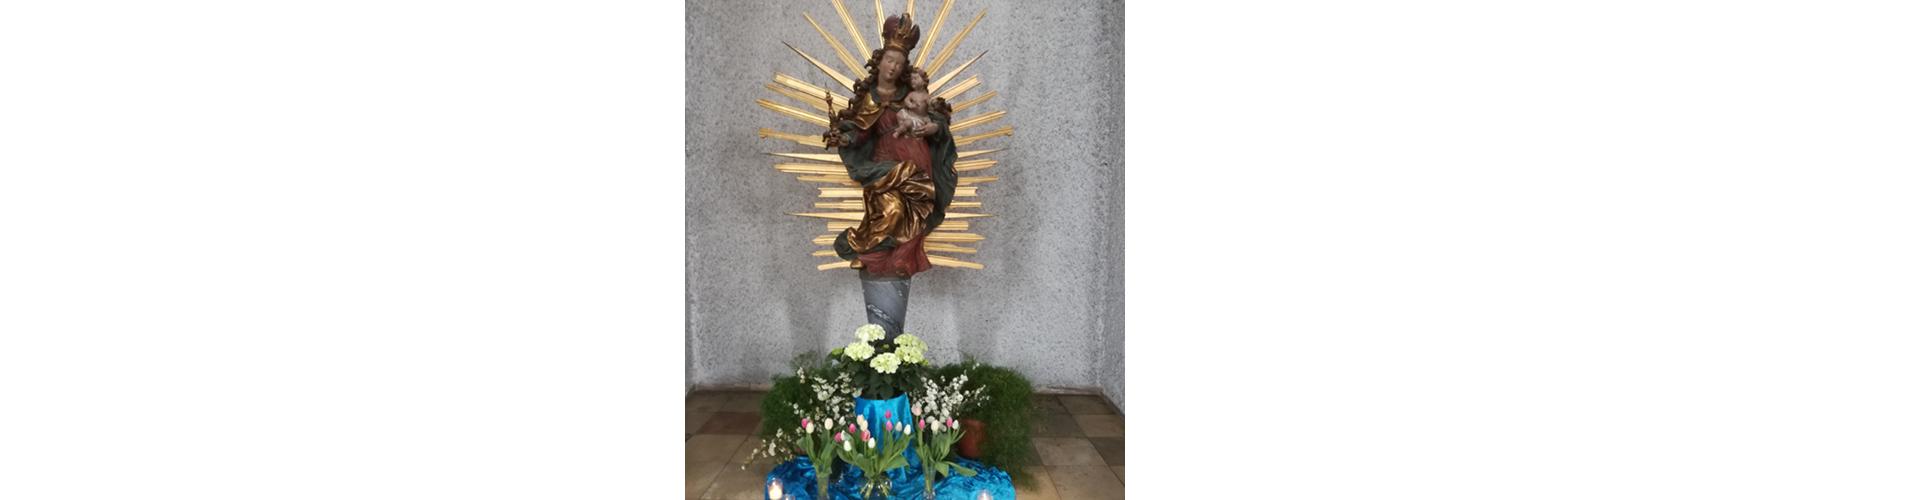 Marienfigur1 Kopie